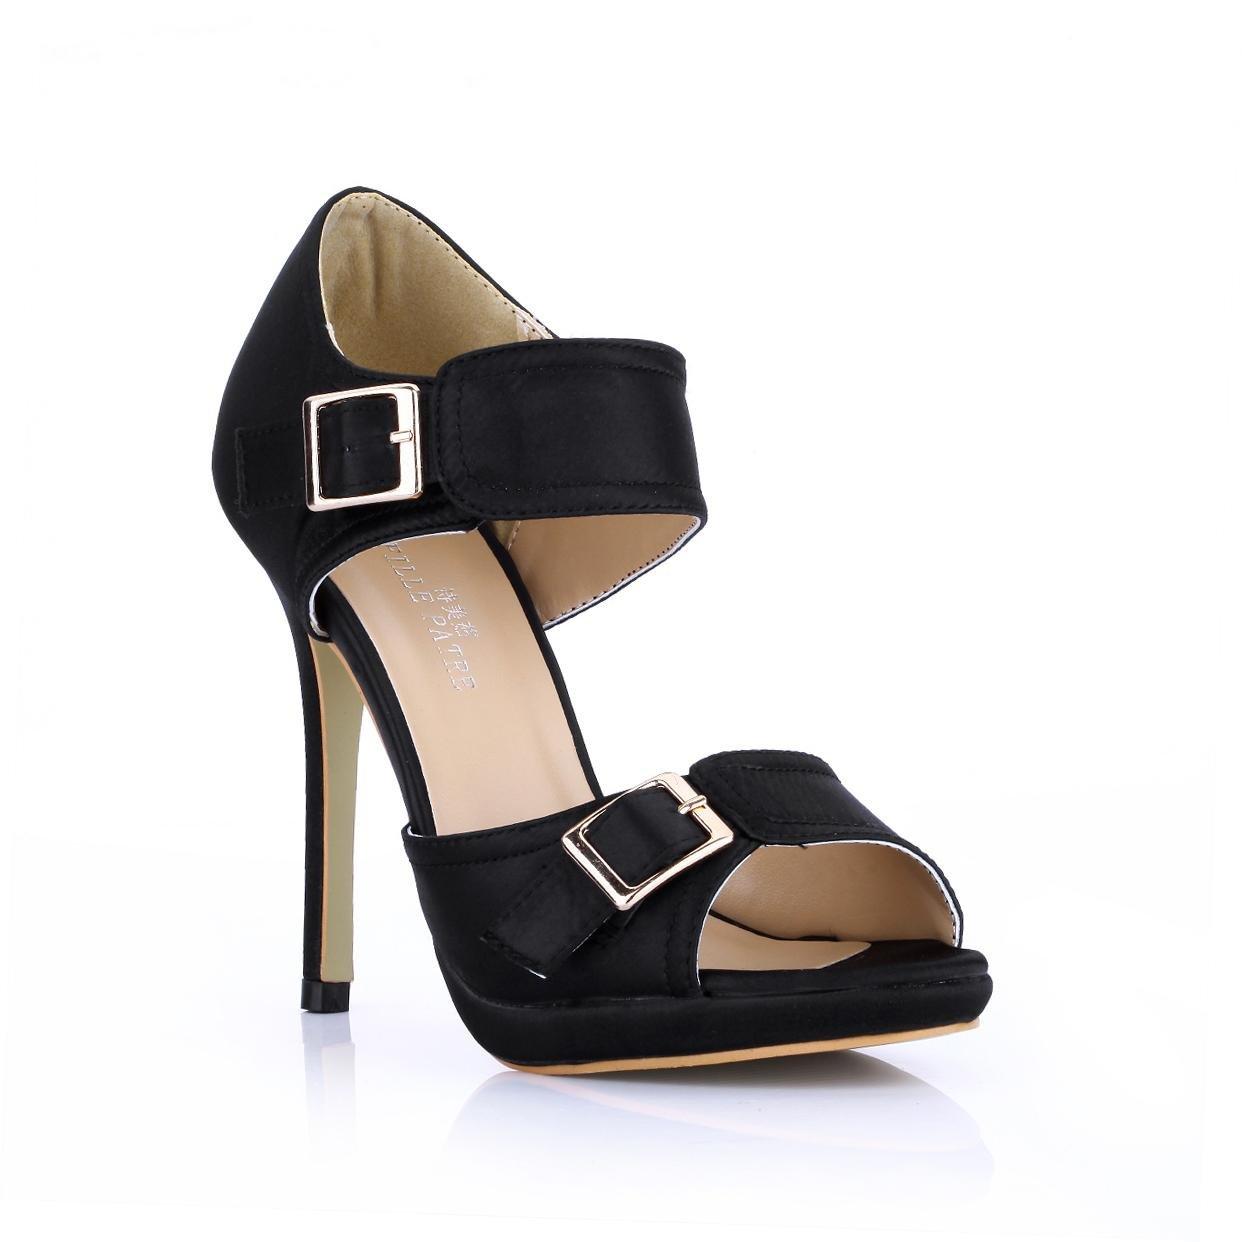 - Best 4Ureg; Frauen Sandalen Faux Silk Metall Schnalle Stiletto 12 CM High Heels Peep Toe Sommer Schuhe Schwarz